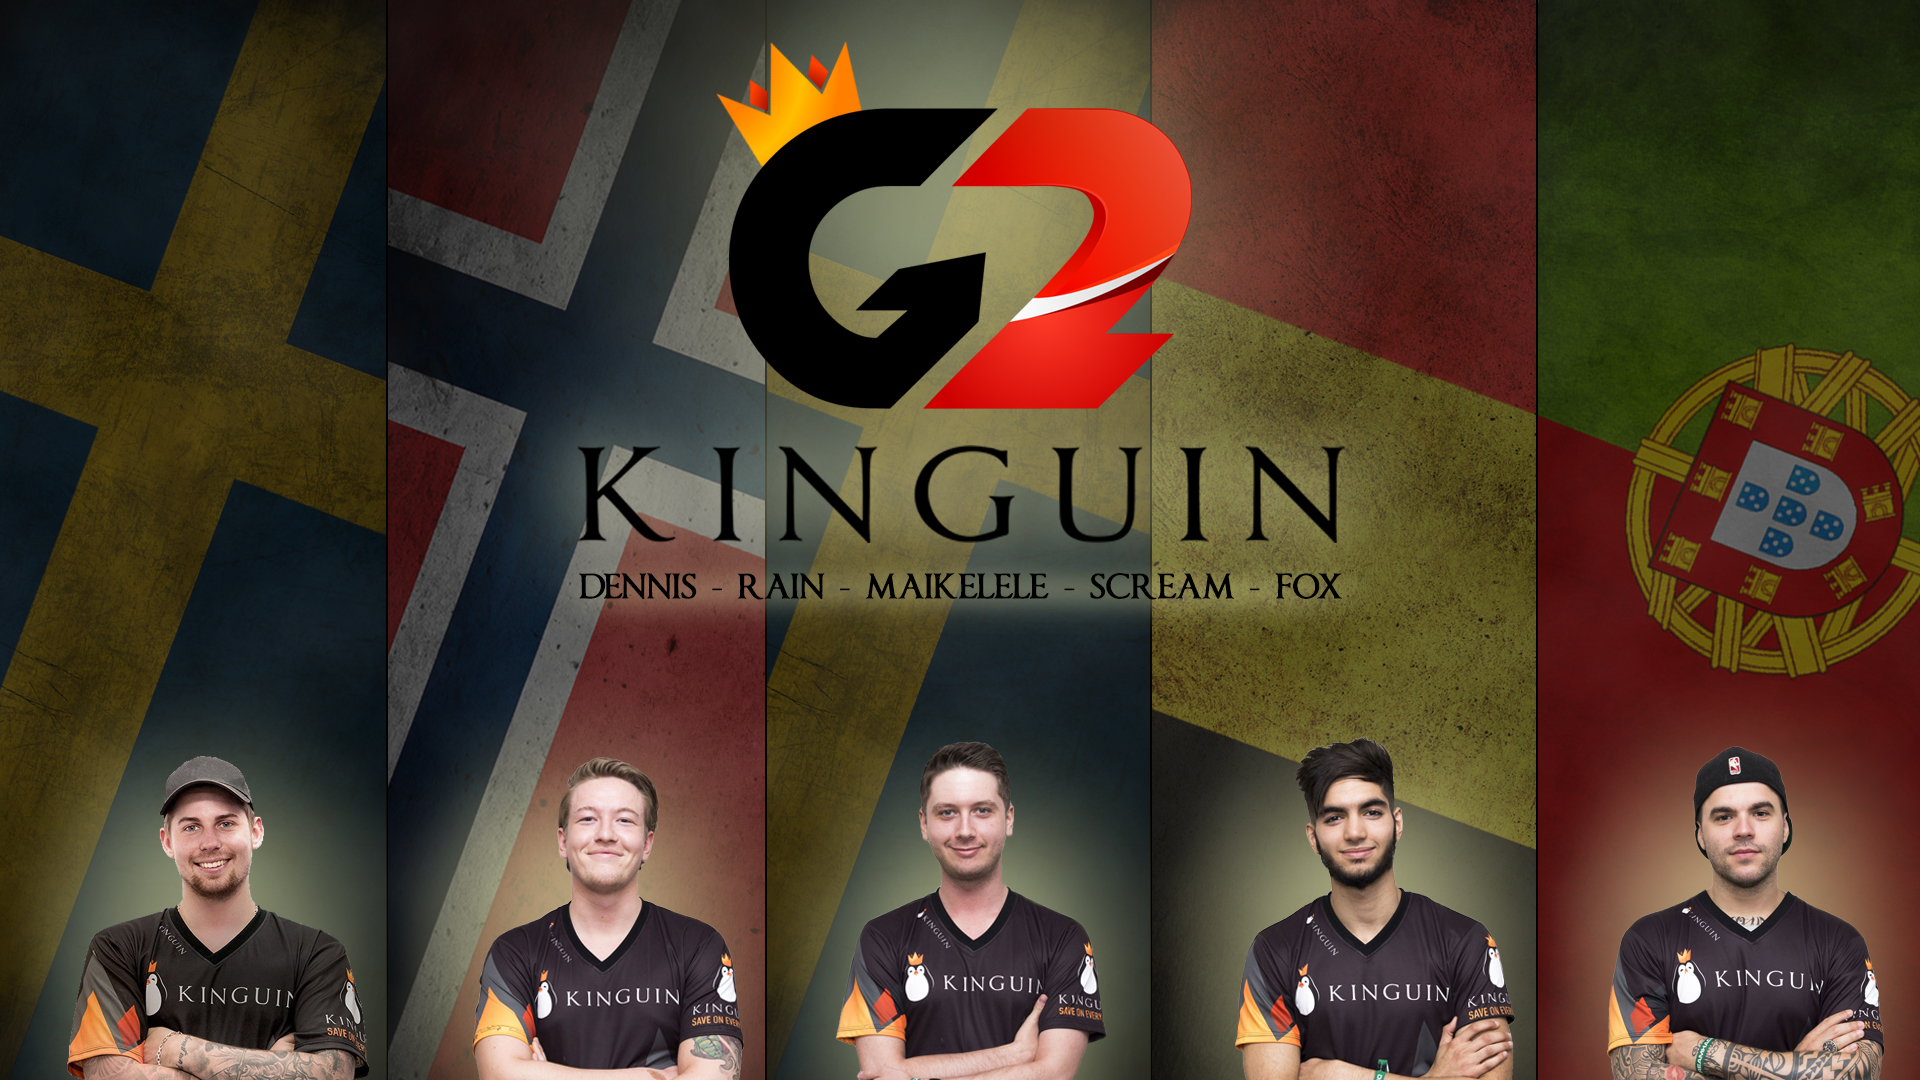 G2 Kinguin